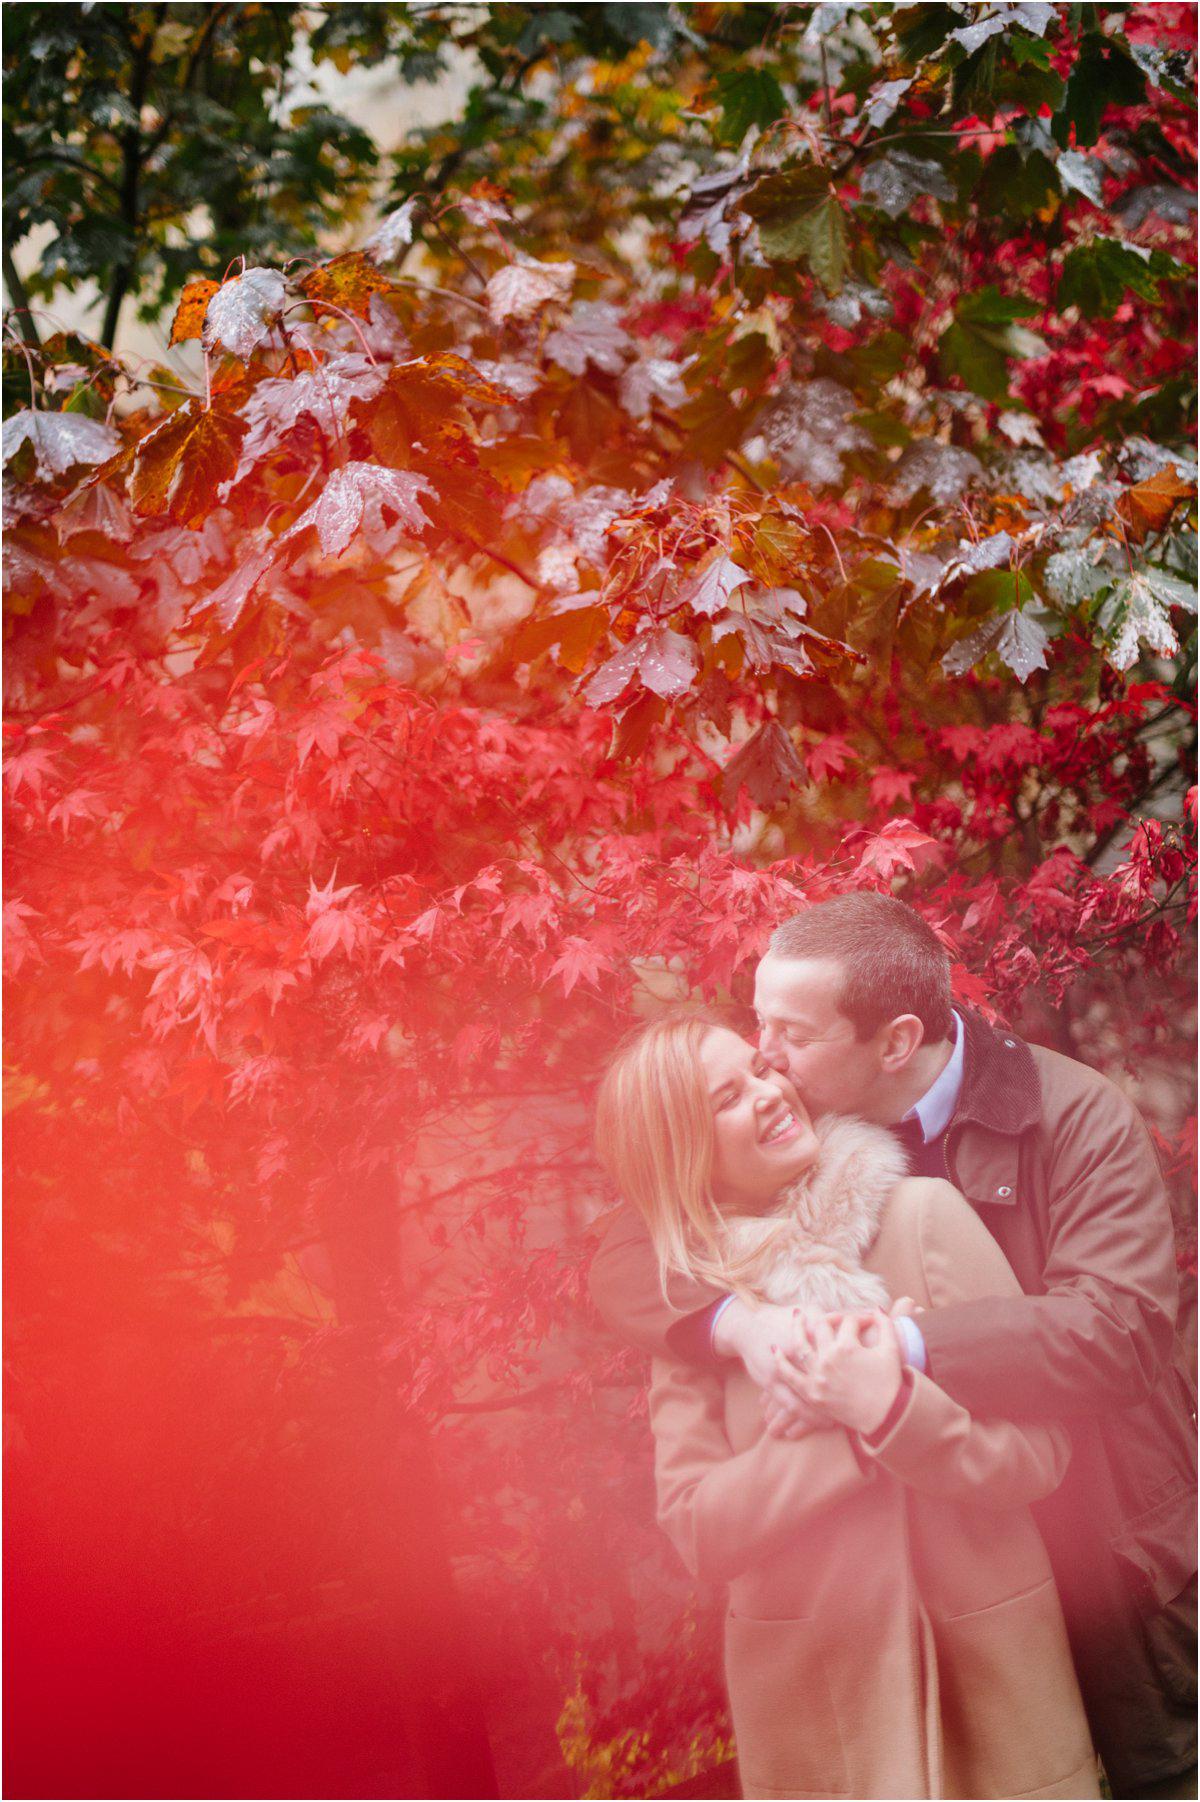 Crofts & Kowalczyk Best Wedding Photography Scotland Blogpost-115.jpg